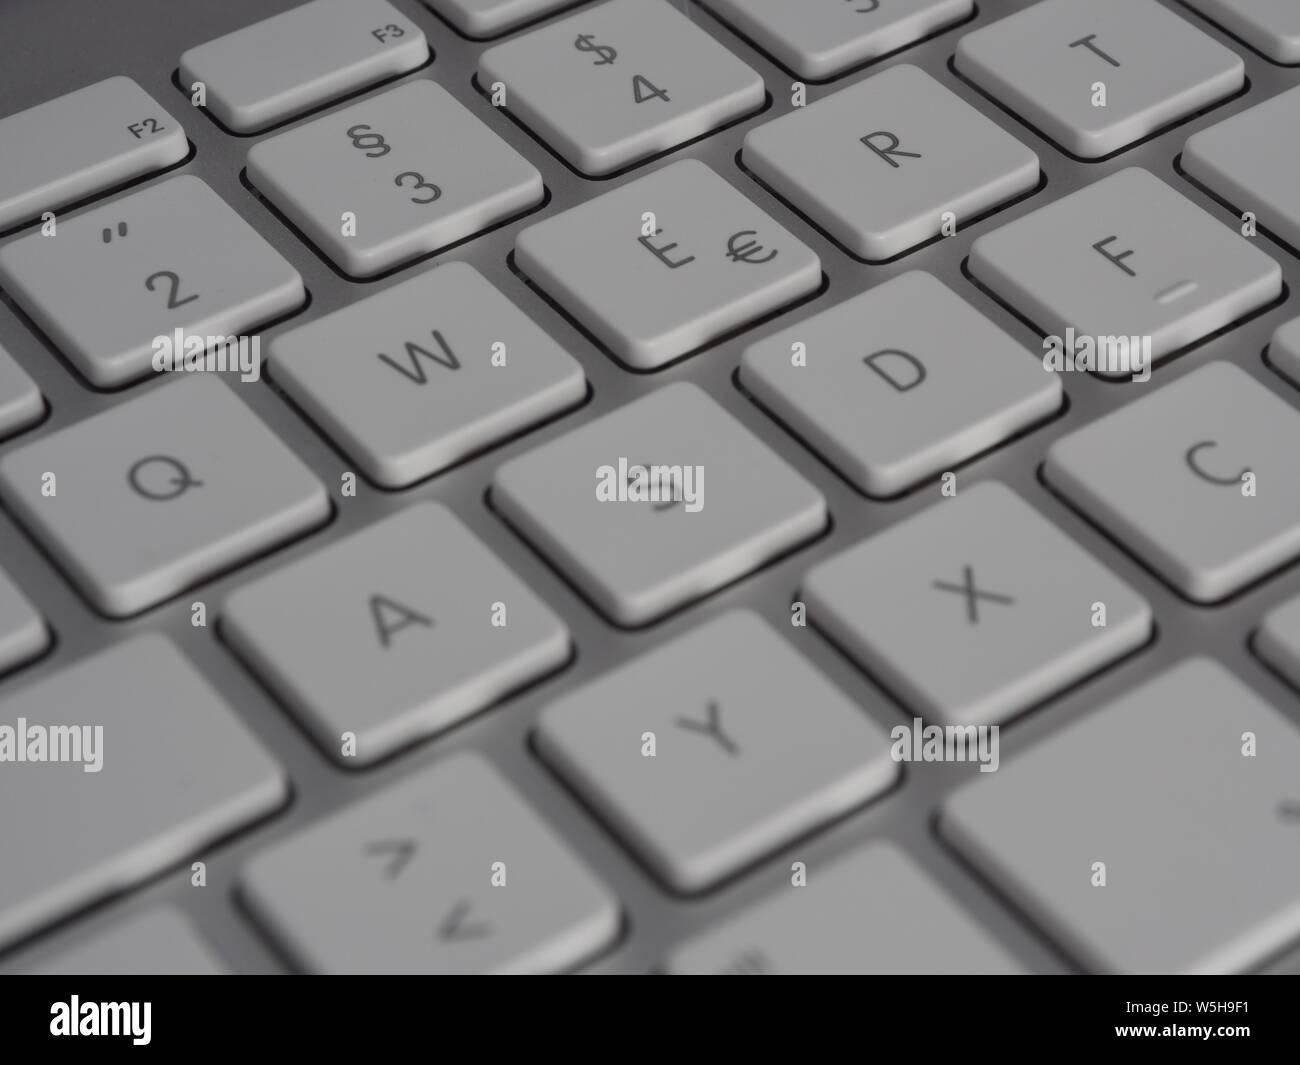 Alphanumeric Keyboard Stock Photos & Alphanumeric Keyboard